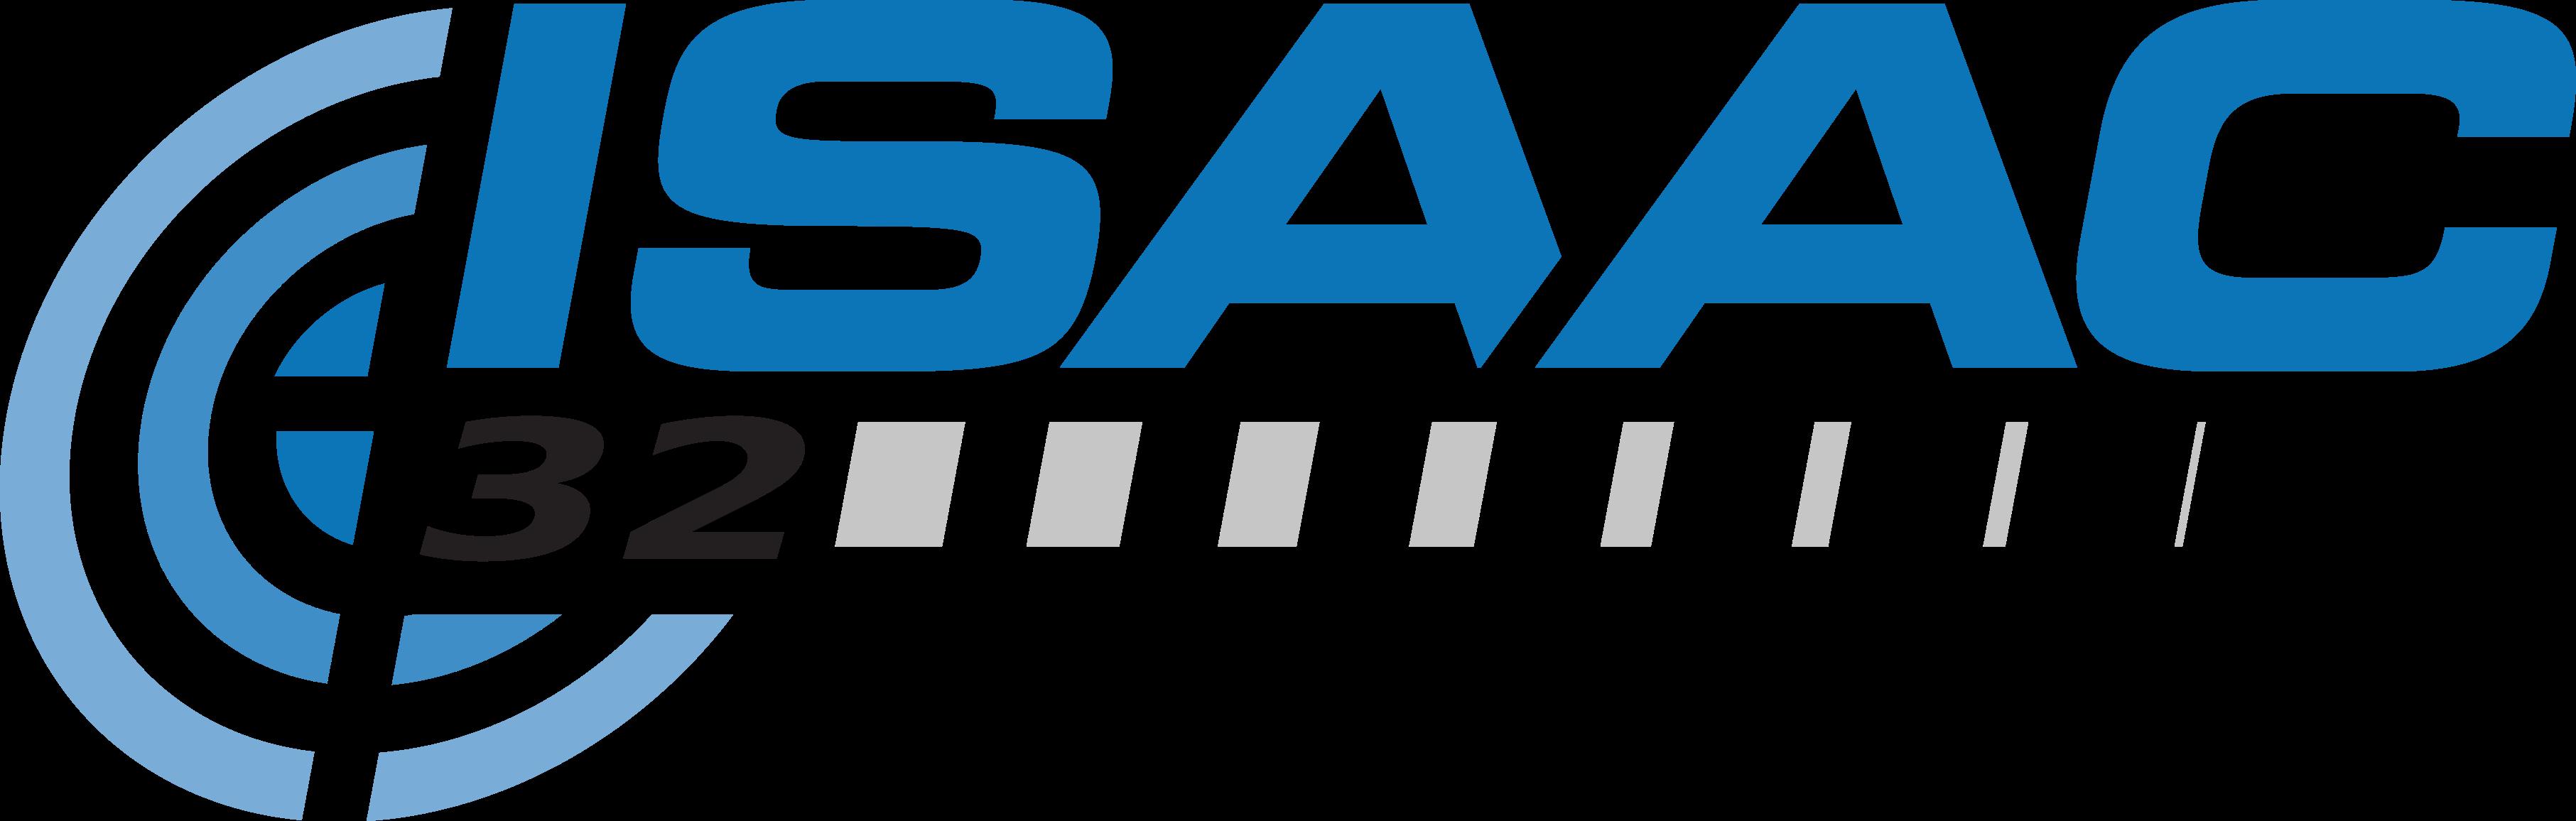 ISAAC32_blokjes_600ppi